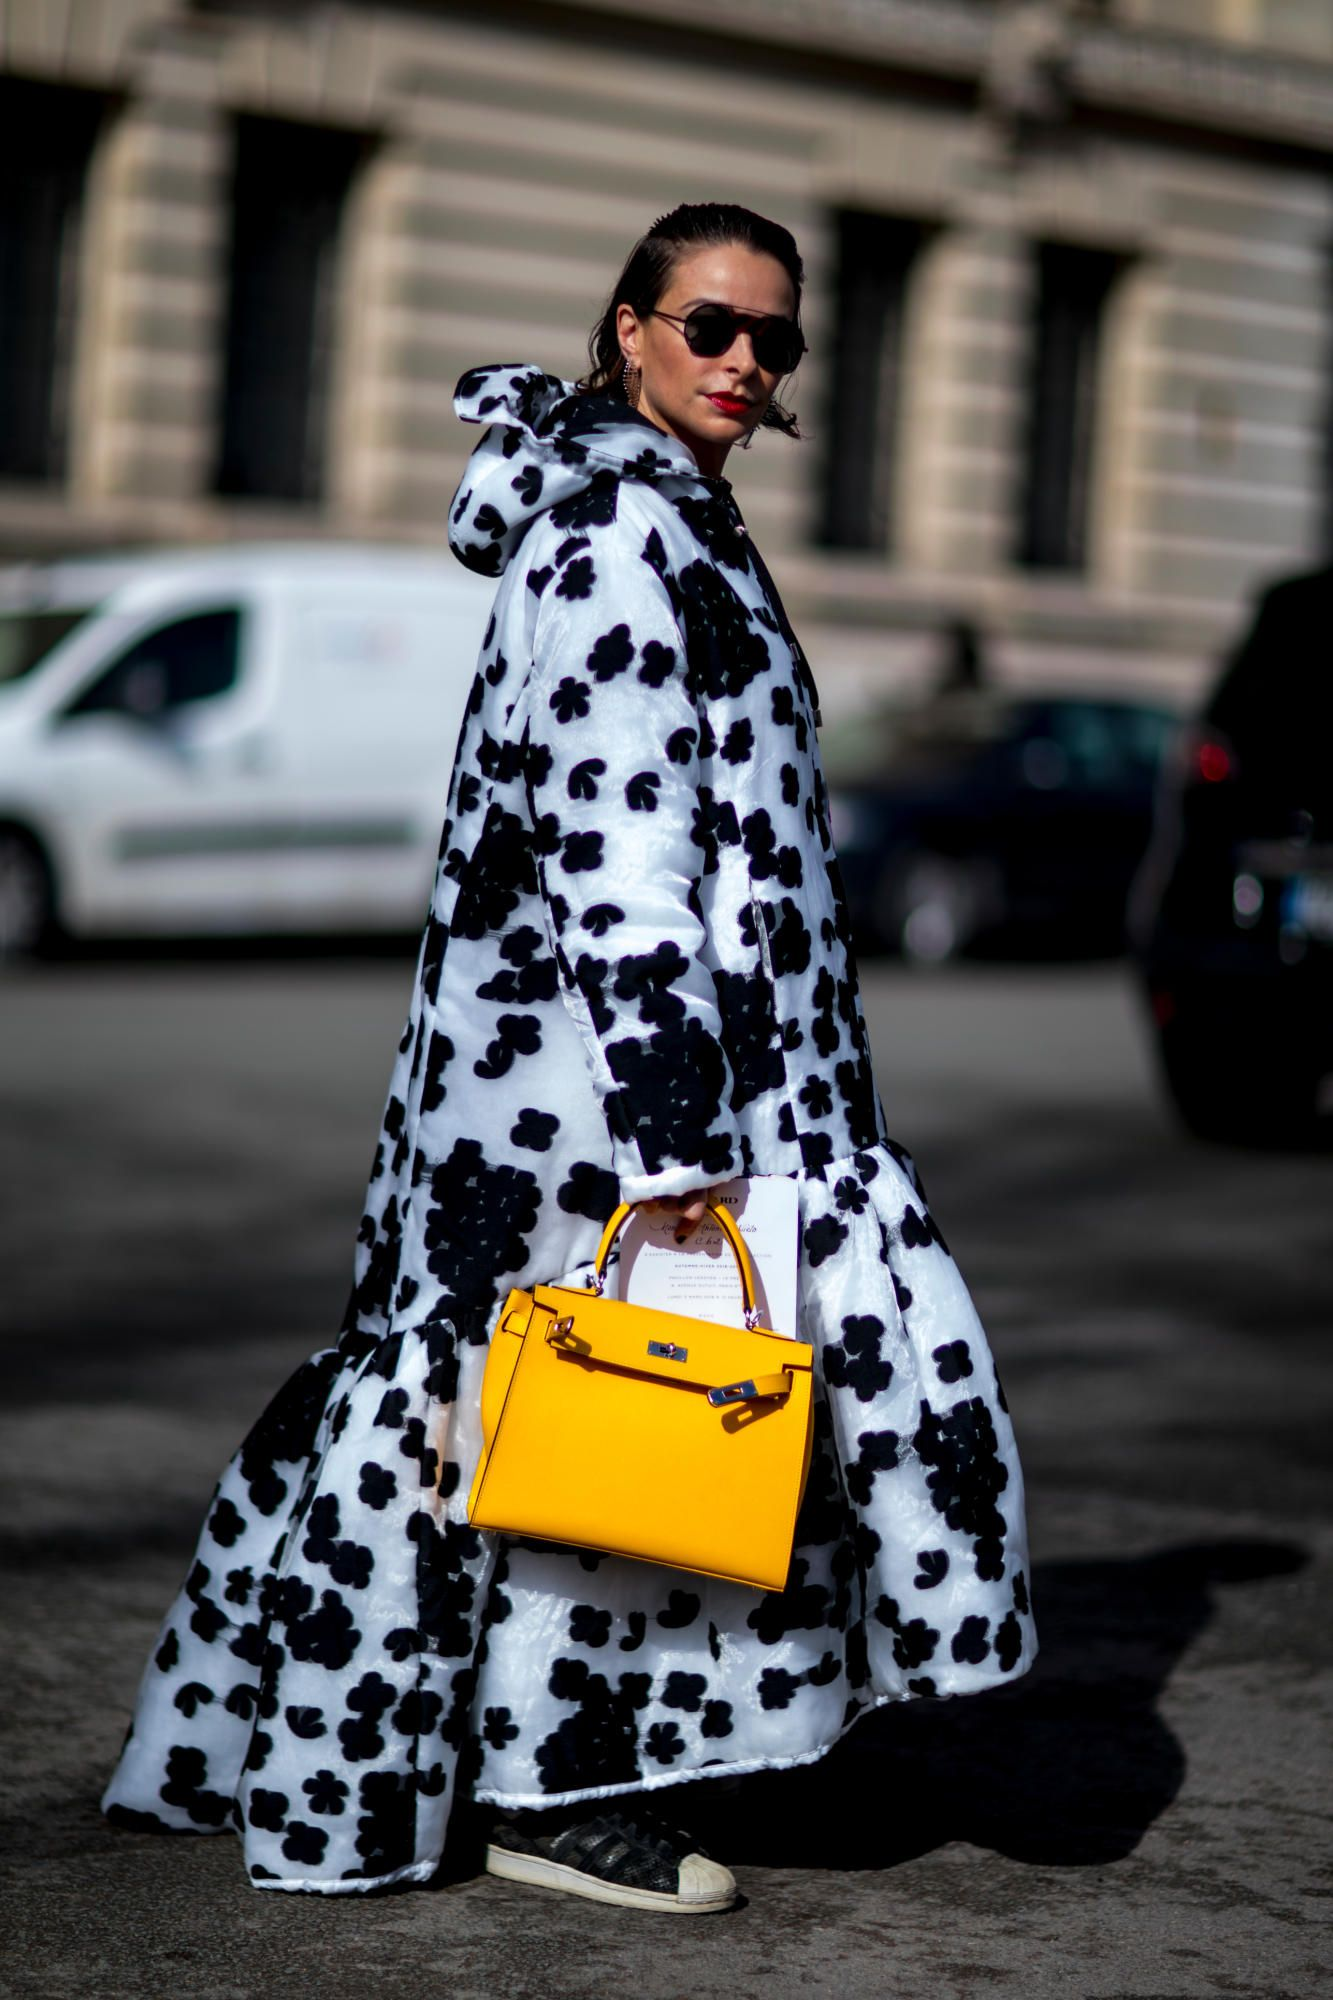 Plaid Was the Street Style Theme on Day 7 of Paris Fashion Week - Fashionista